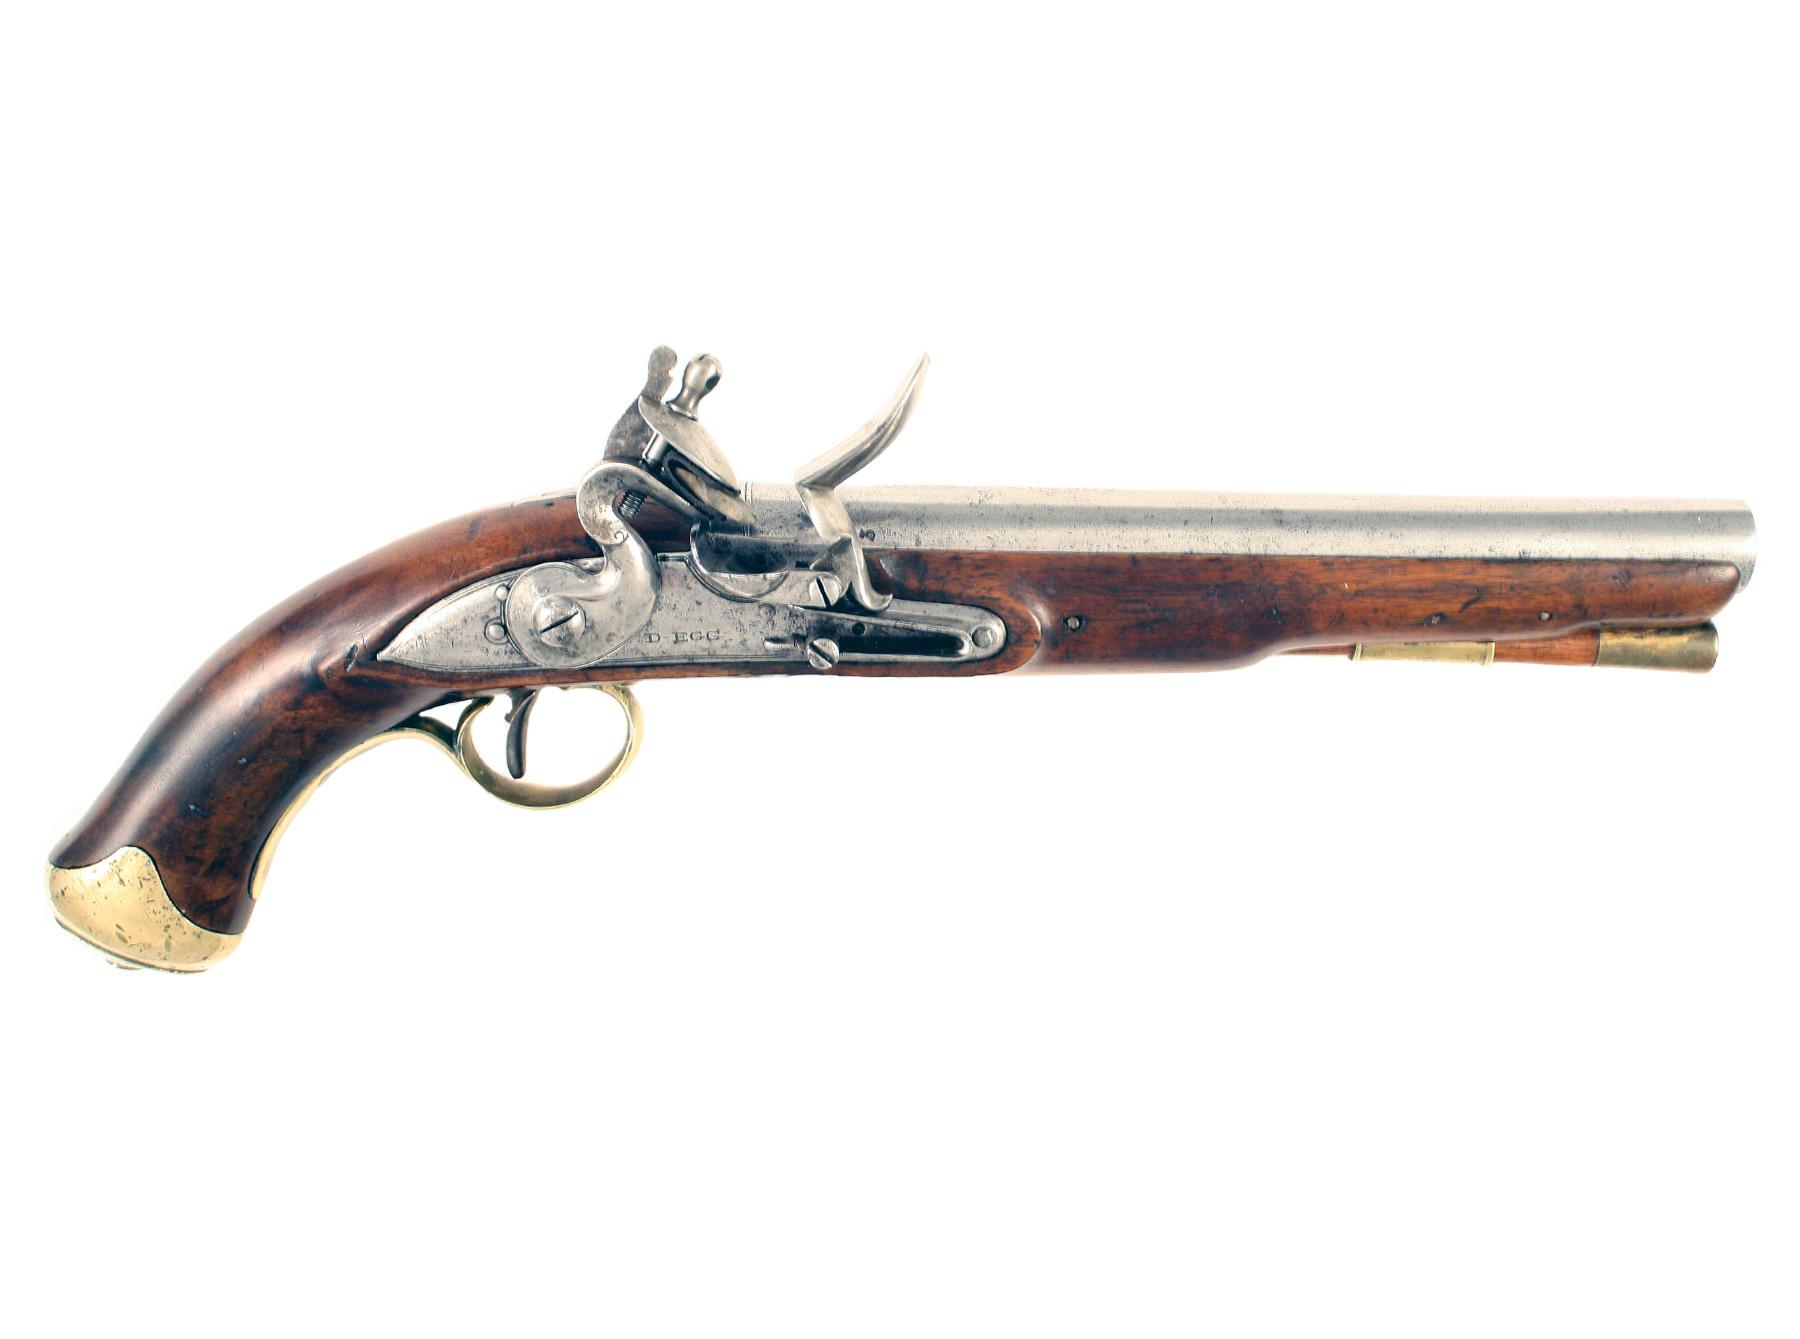 A D.Egg Officers Pistol